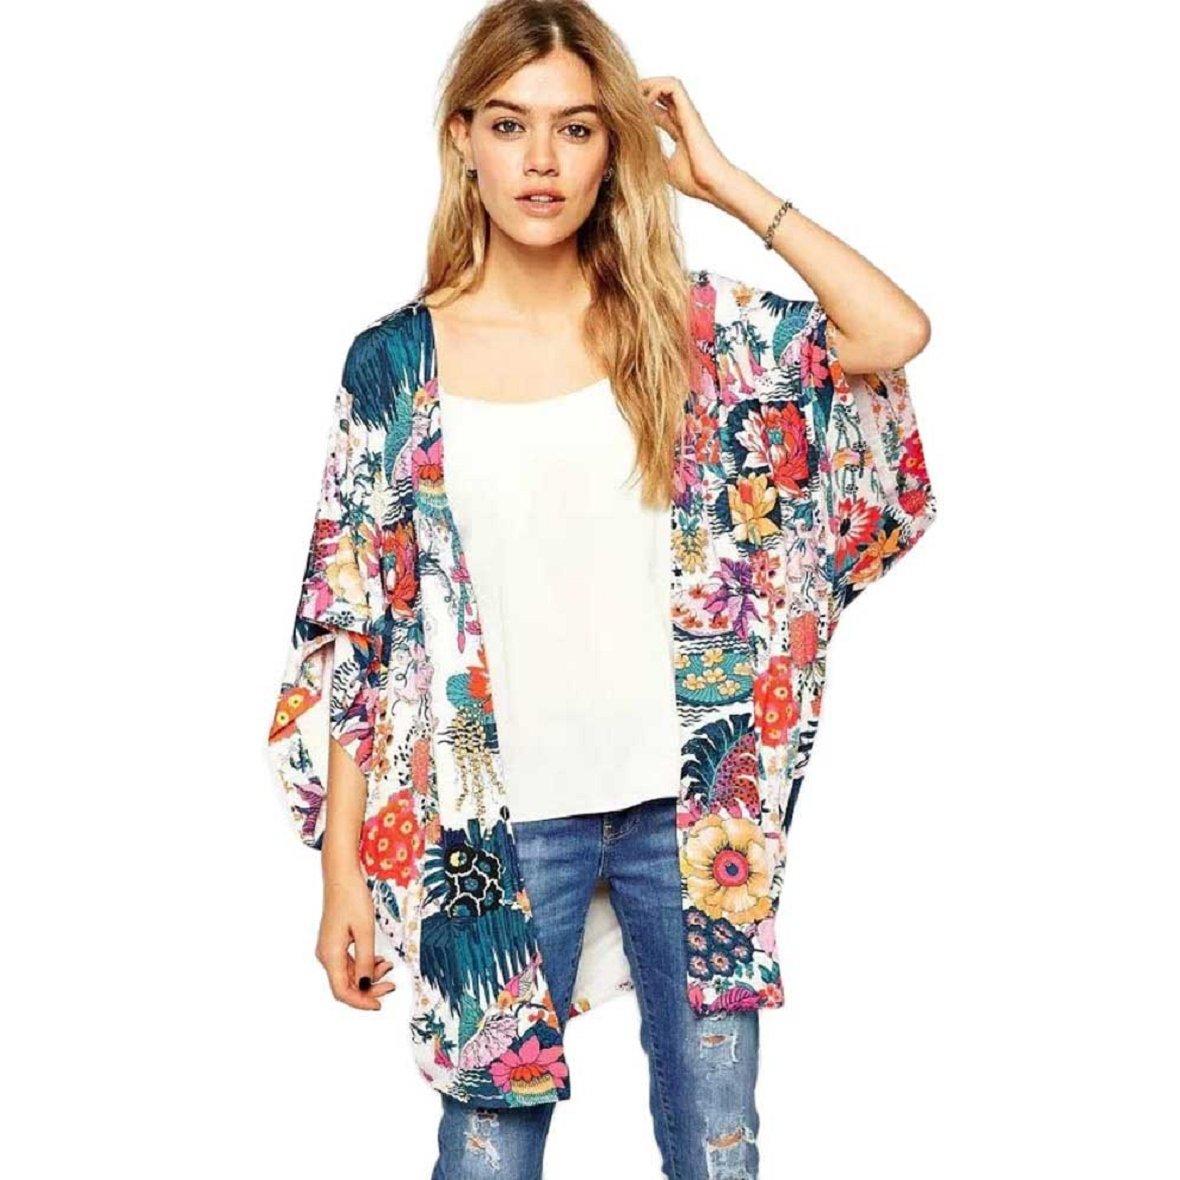 Tonsee Women Kimono Loose Cardigan Chiffon Tops Blouse tonsee-25065